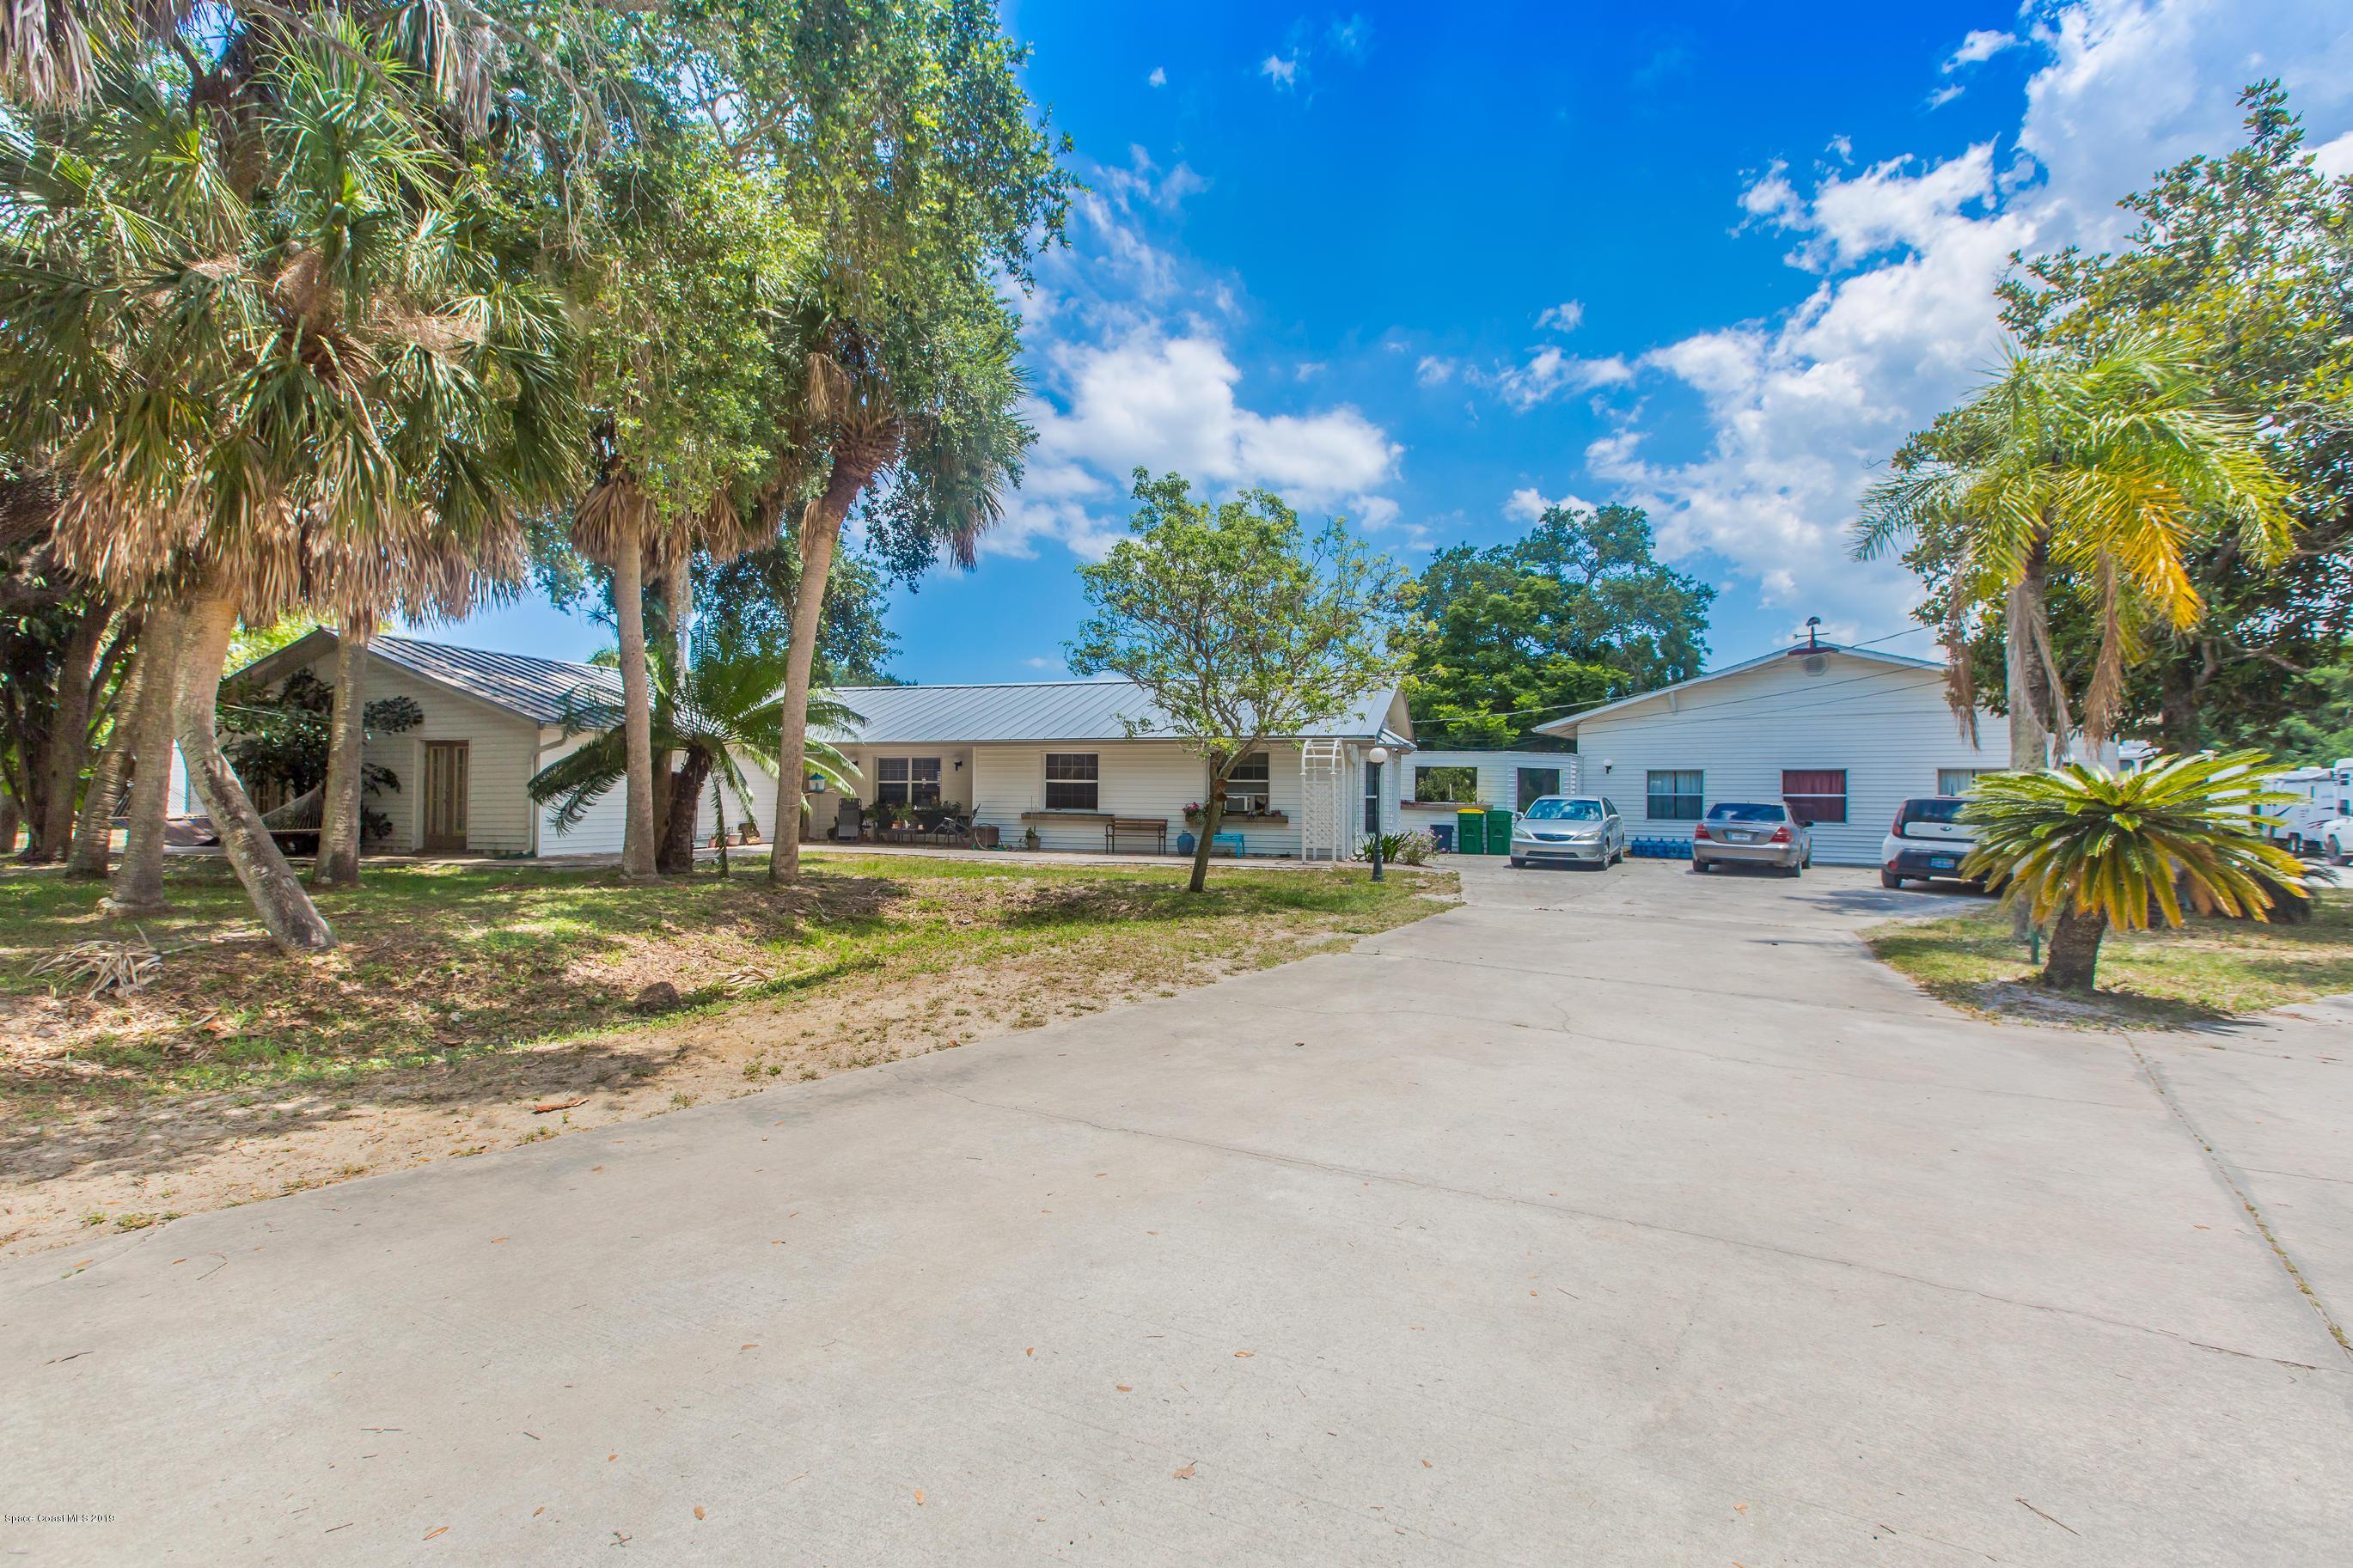 Multi-Family Homes for Sale at 1555 Dalbora Merritt Island, Florida 32953 United States